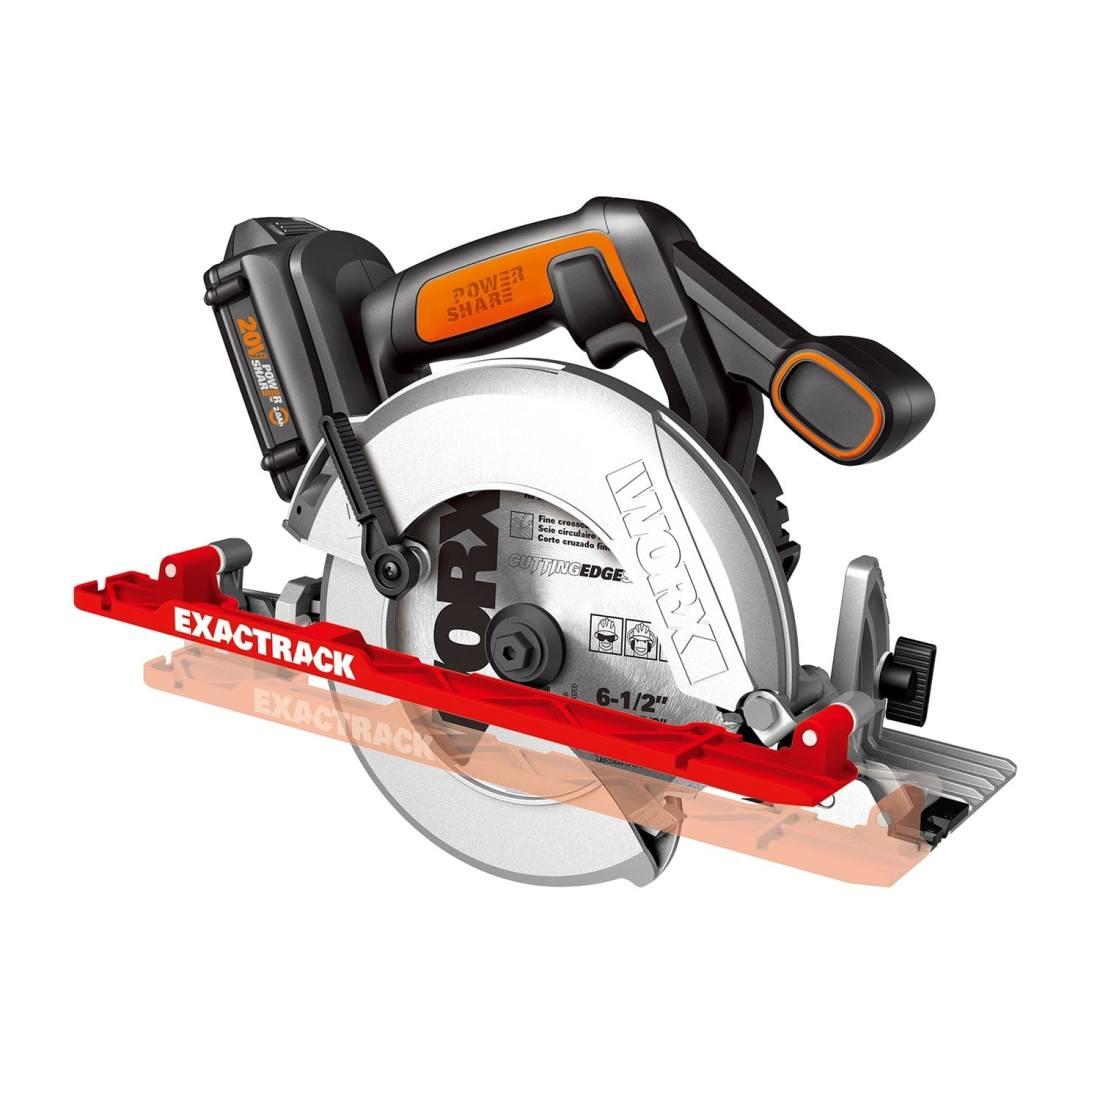 WORX Exactrack 20V circular saw